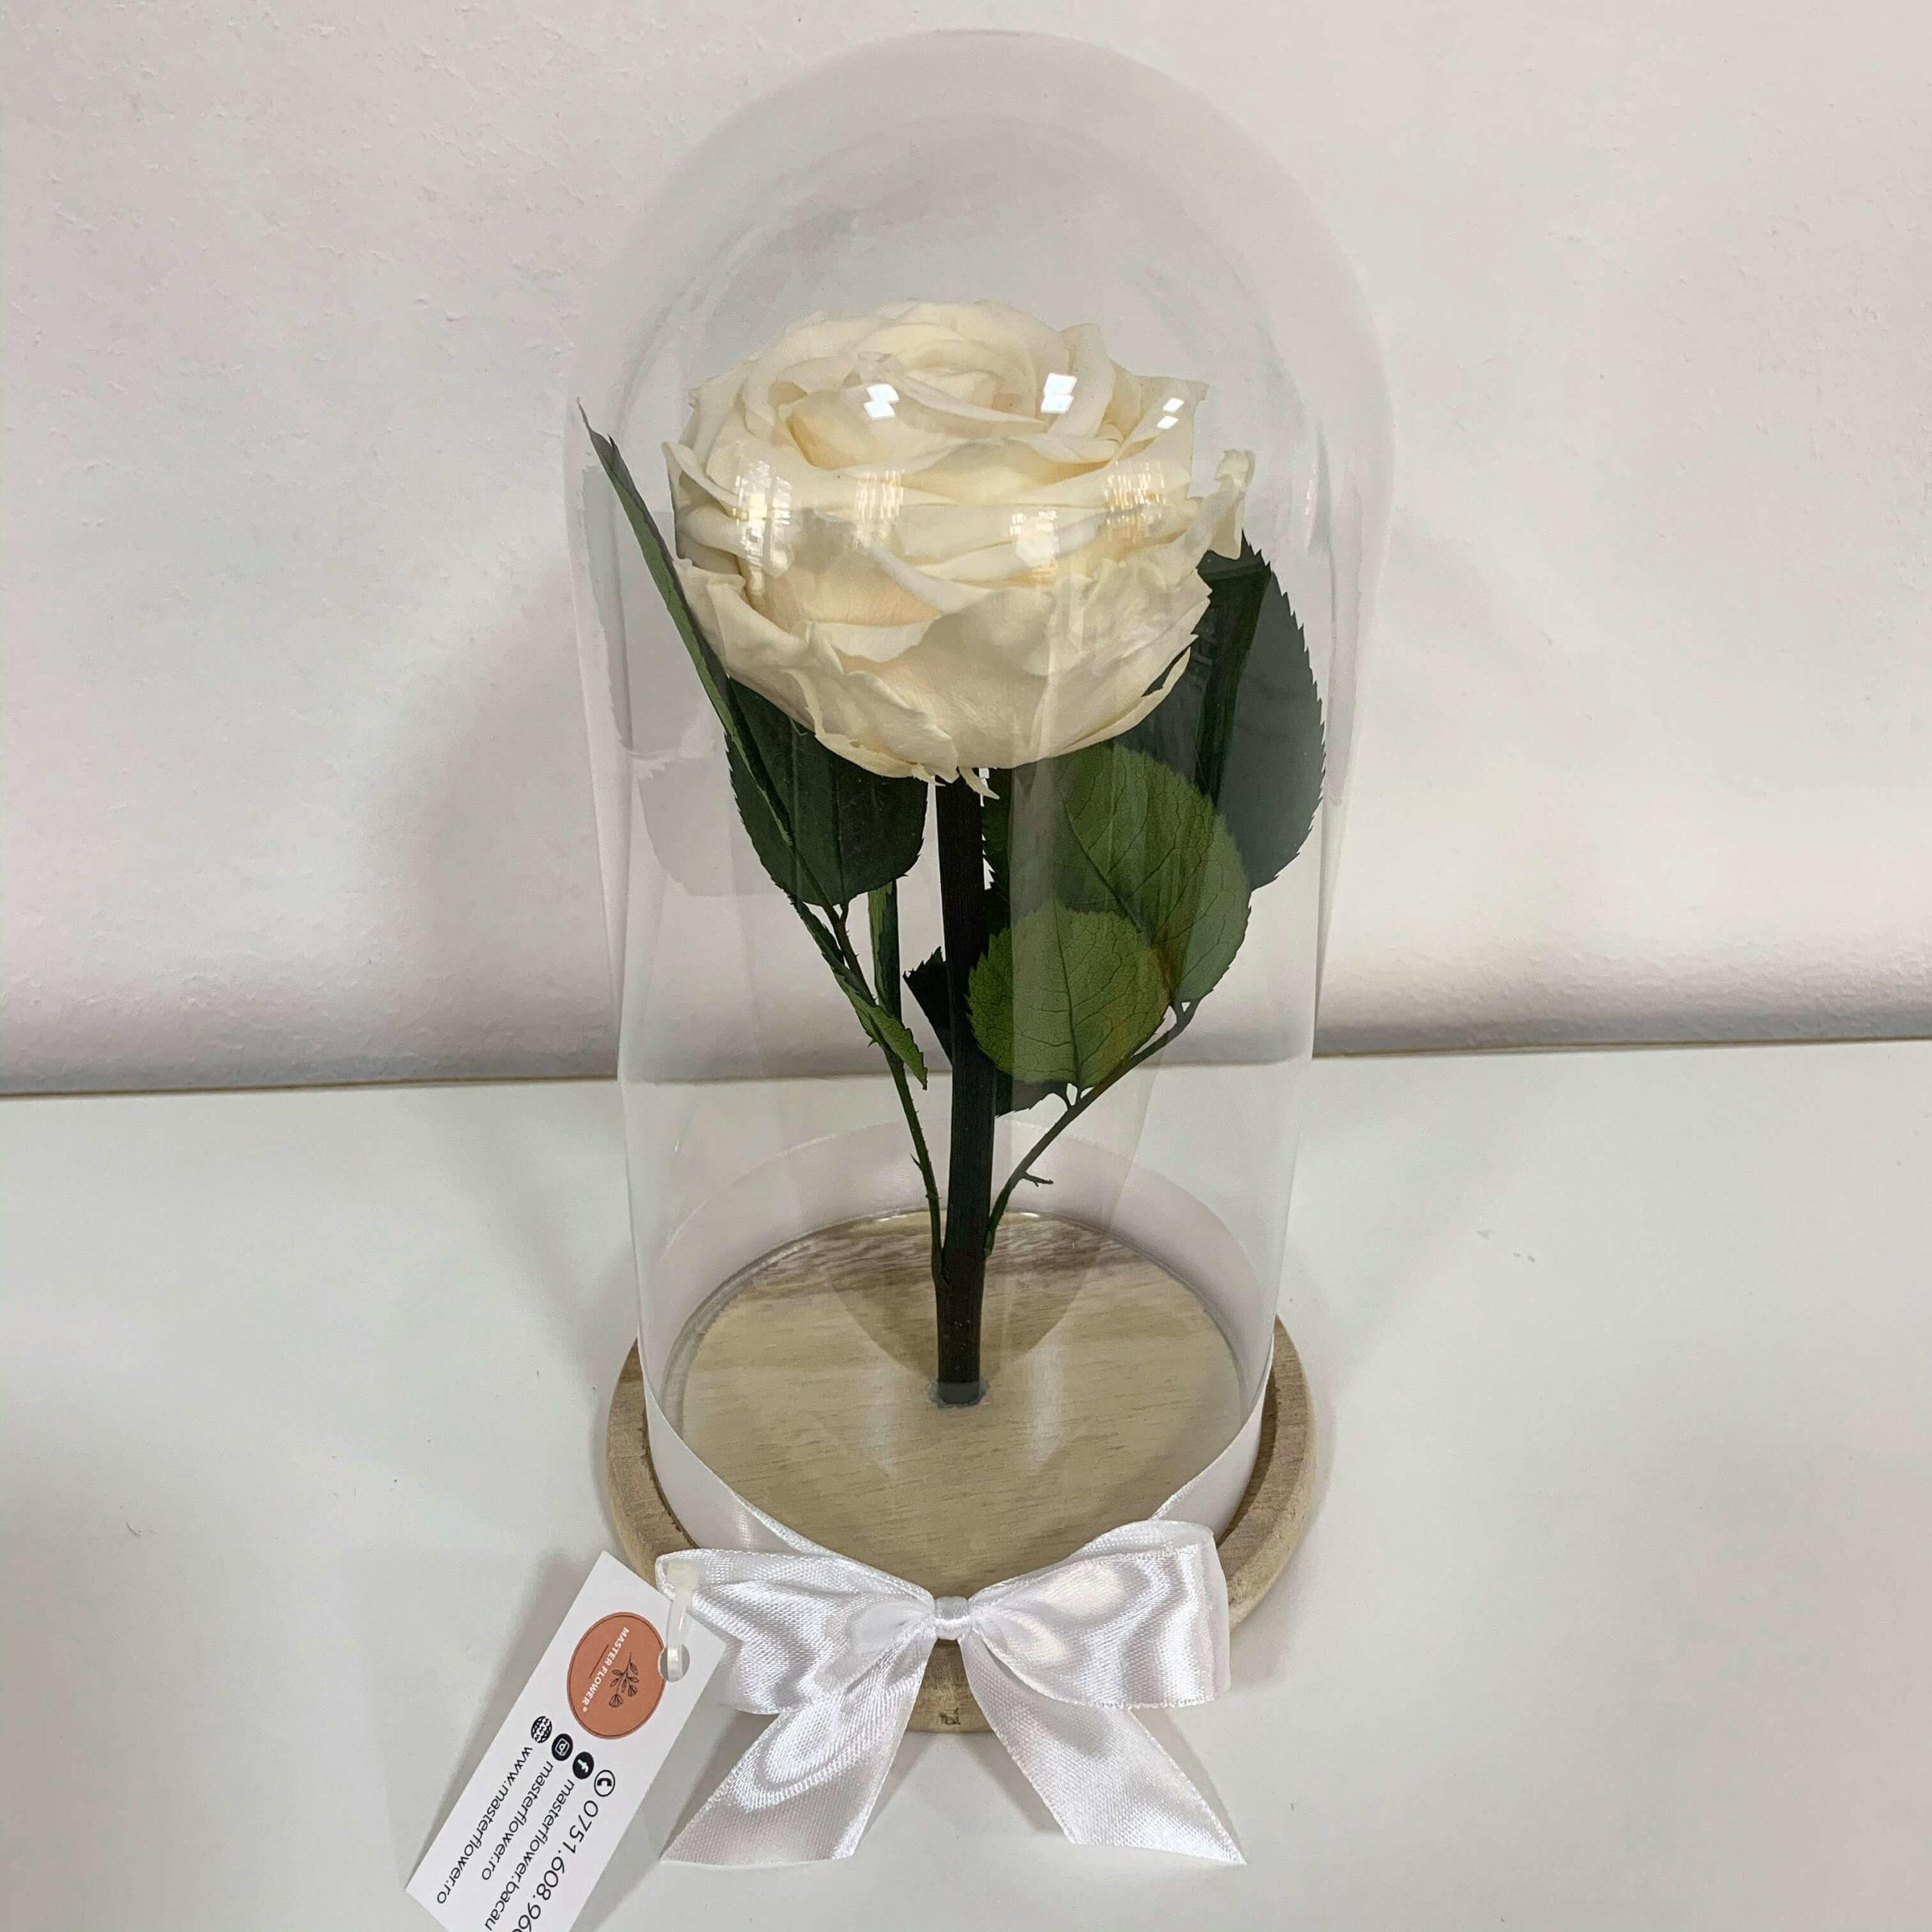 Trandafir criogenat alb - Champagne